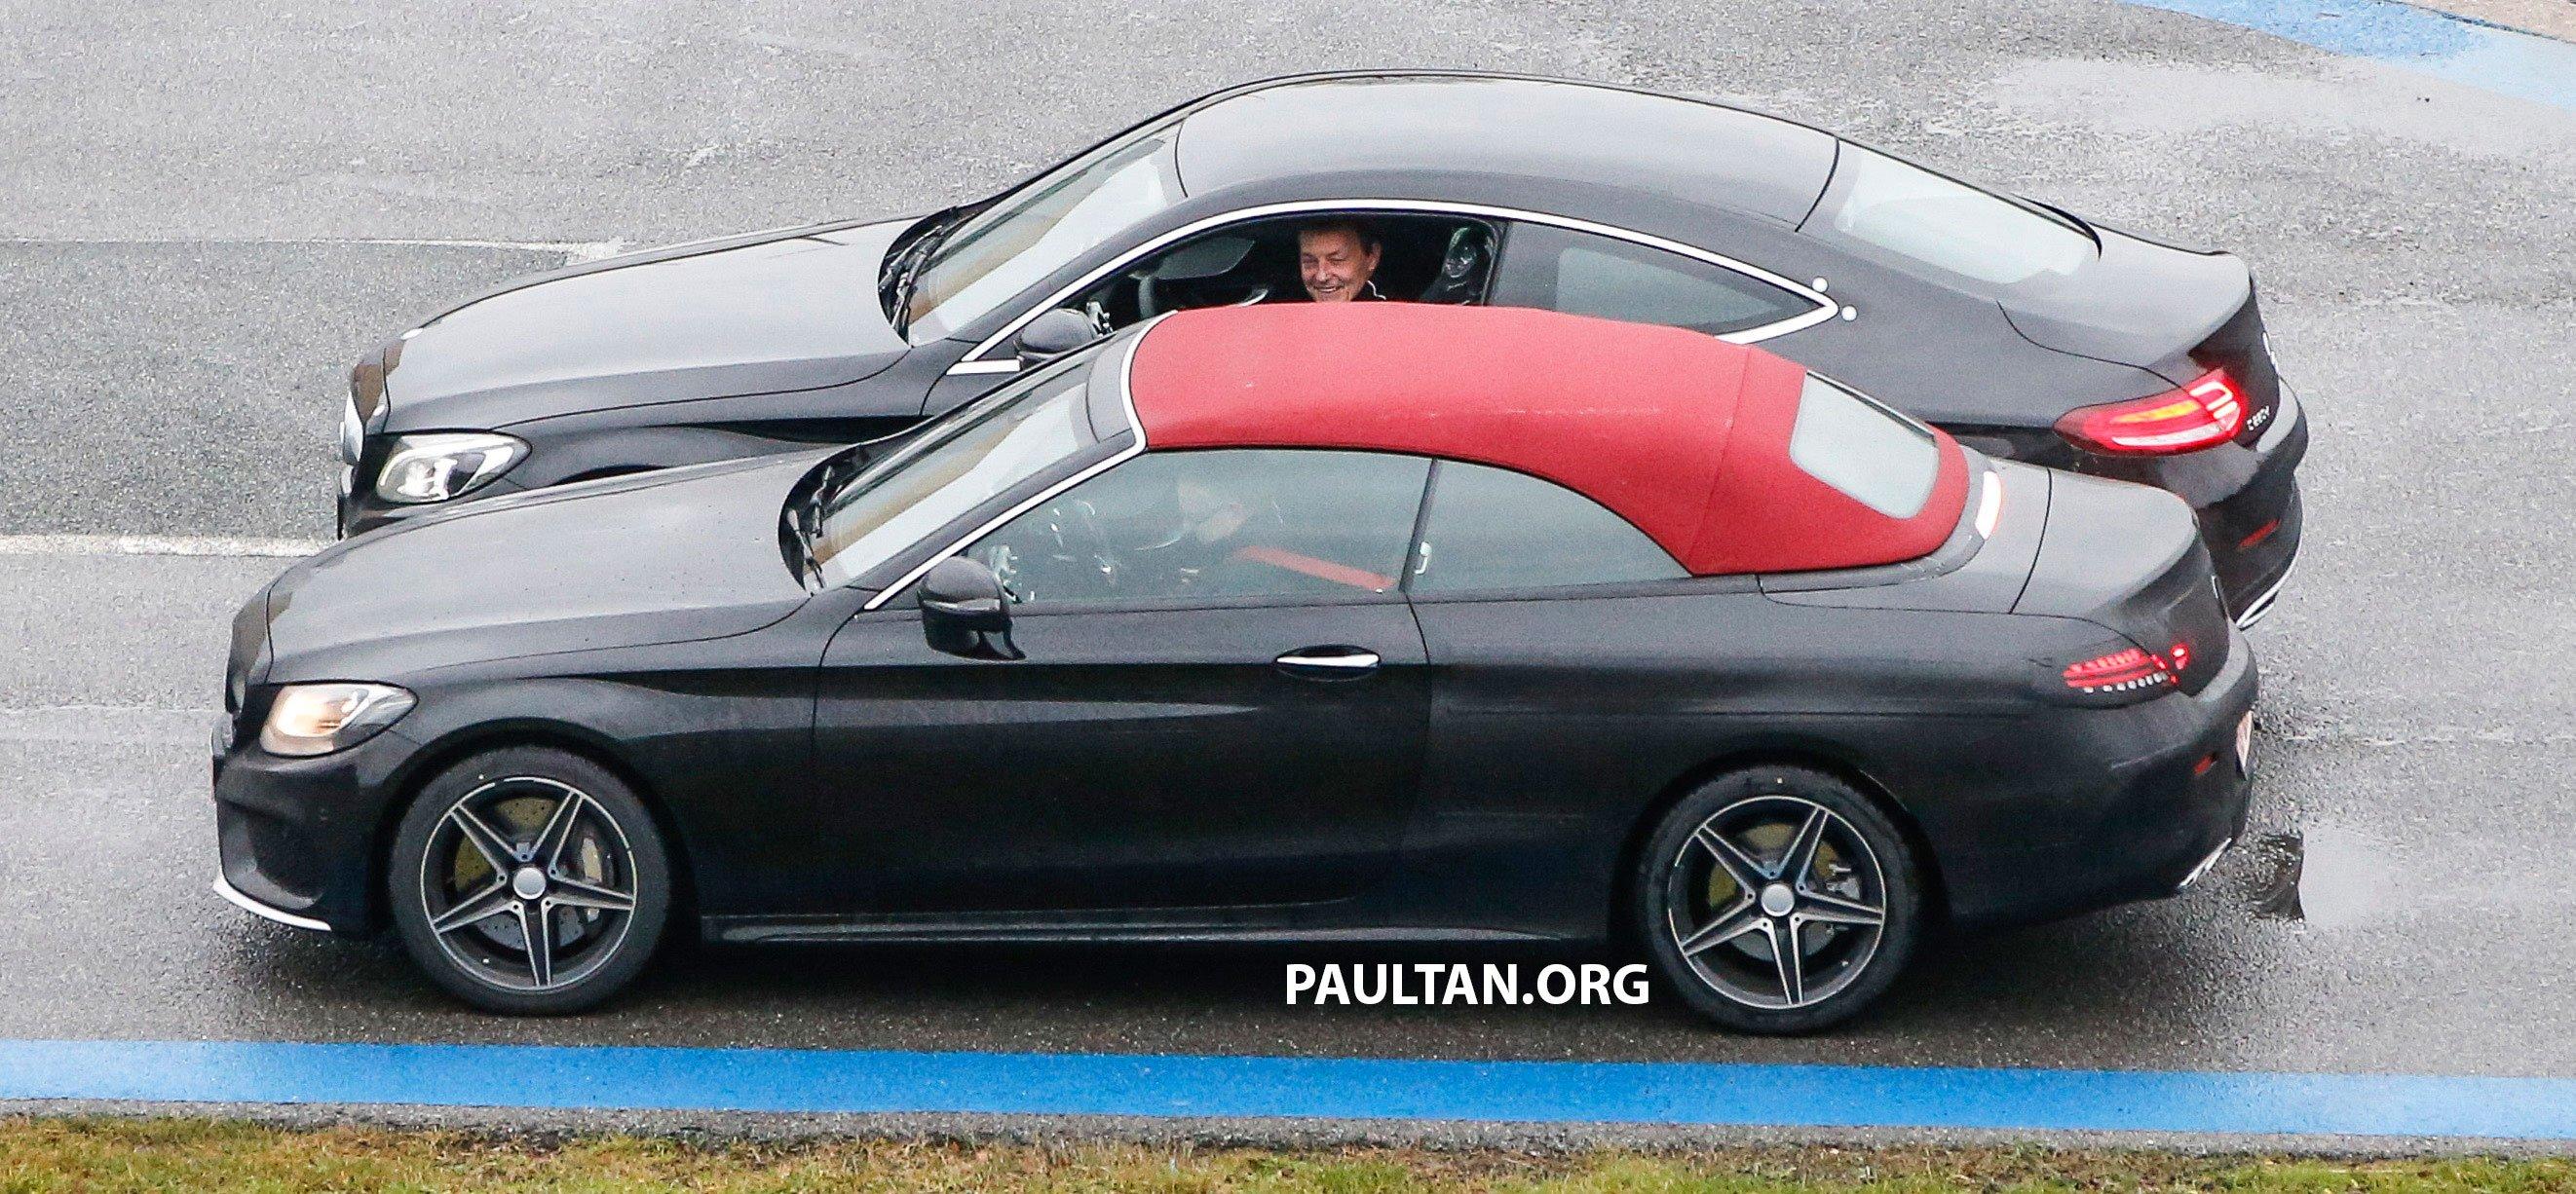 SPIED: Mercedes-Benz C-Class Cabriolet undisguised Paul ...